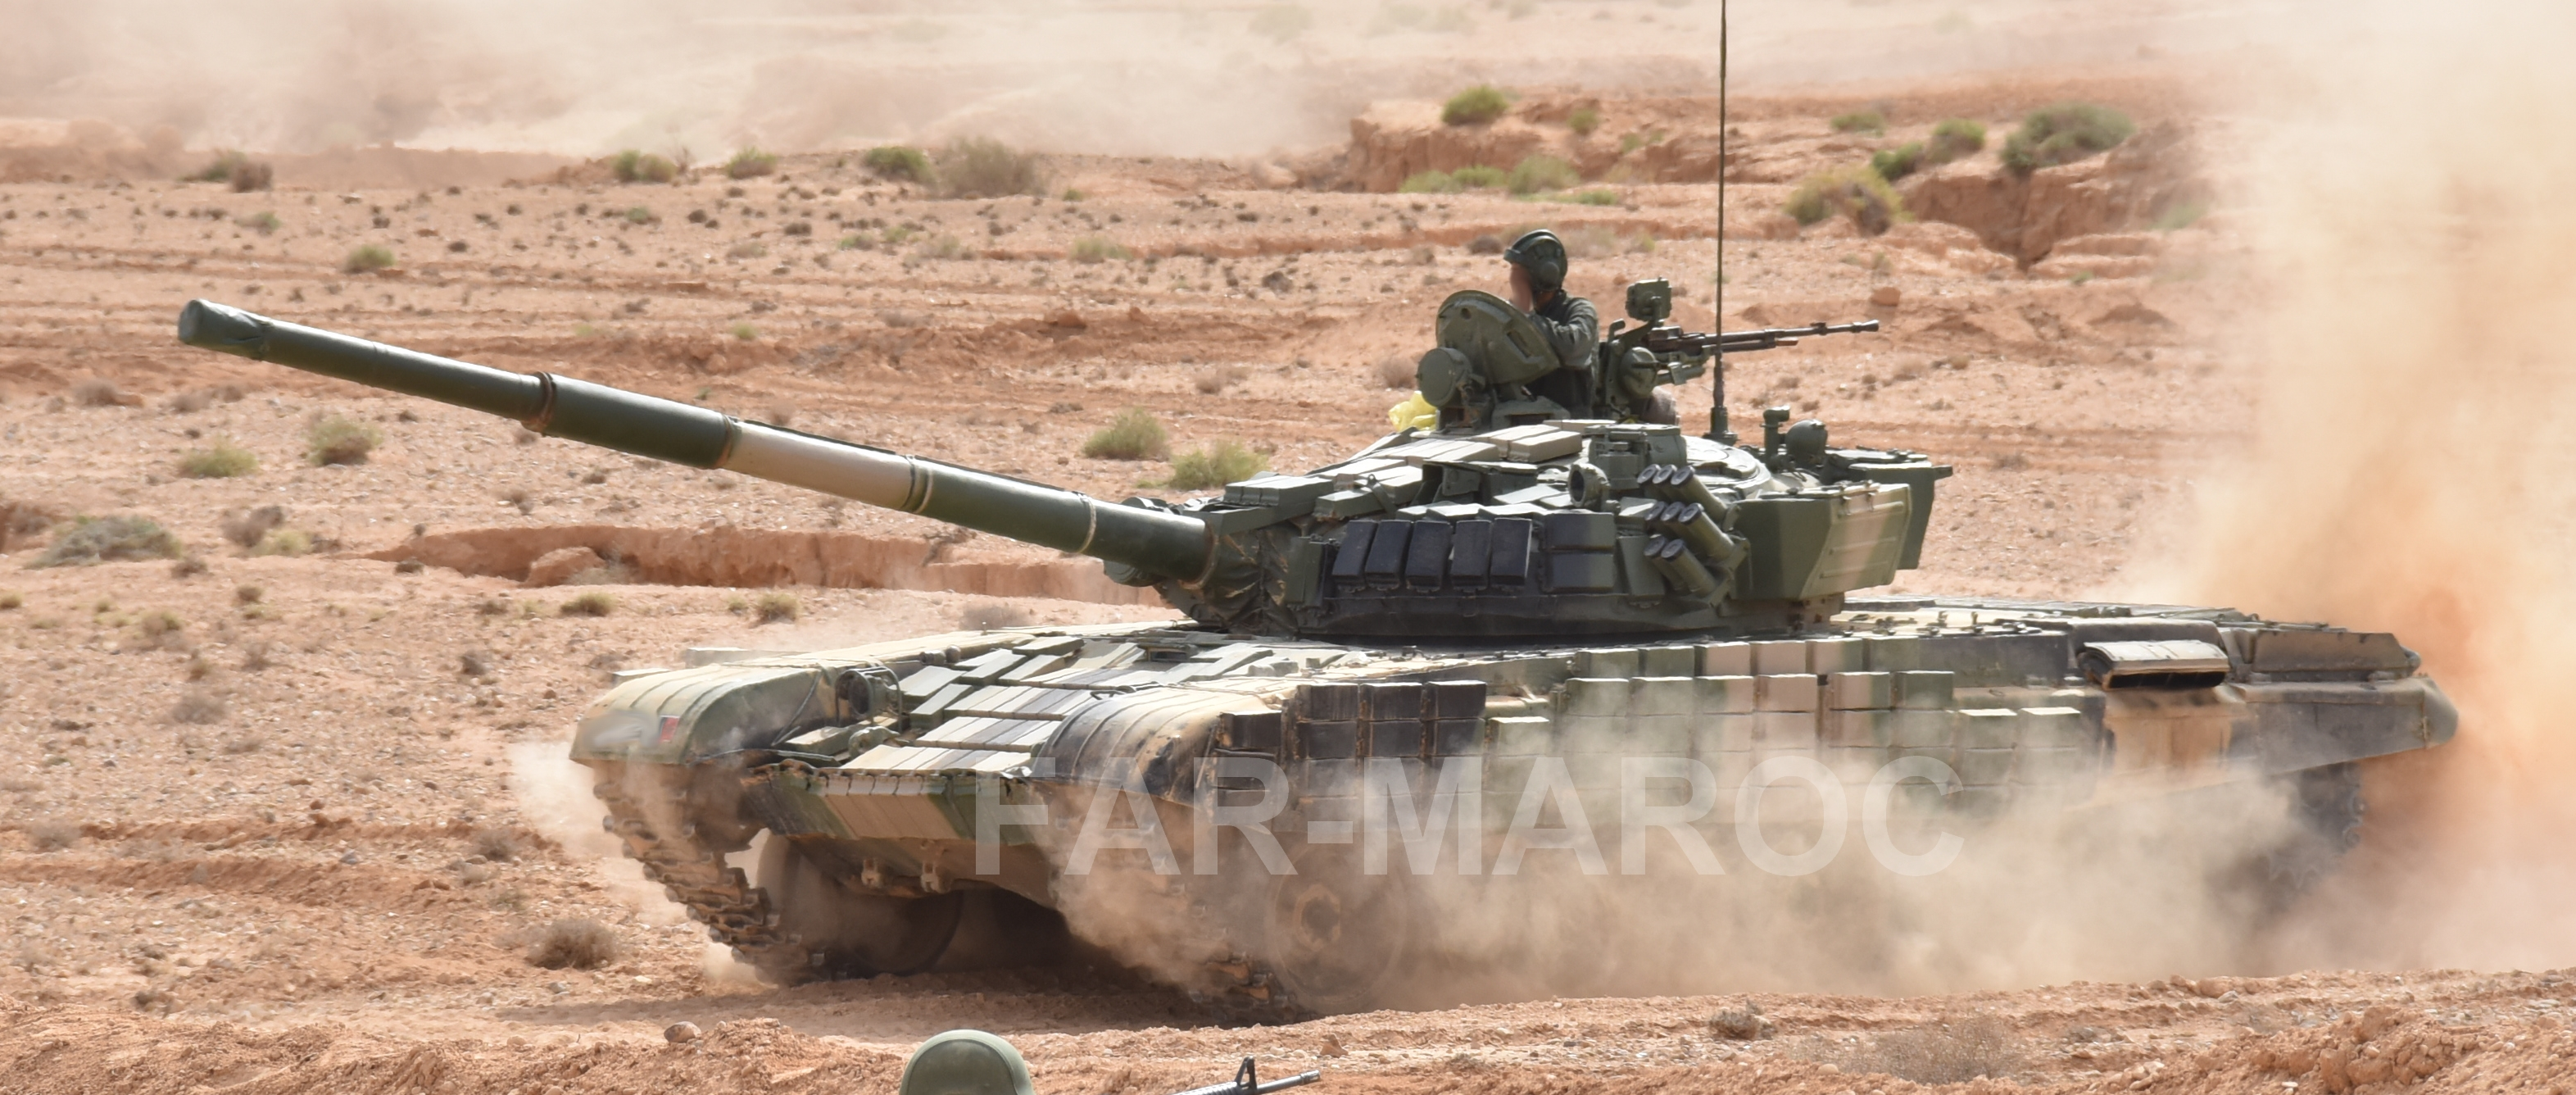 Chars T-72B/BK MArocains // Moroccan Army T-72B/BK Tanks - Page 6 49173902571_4e73bcb381_o